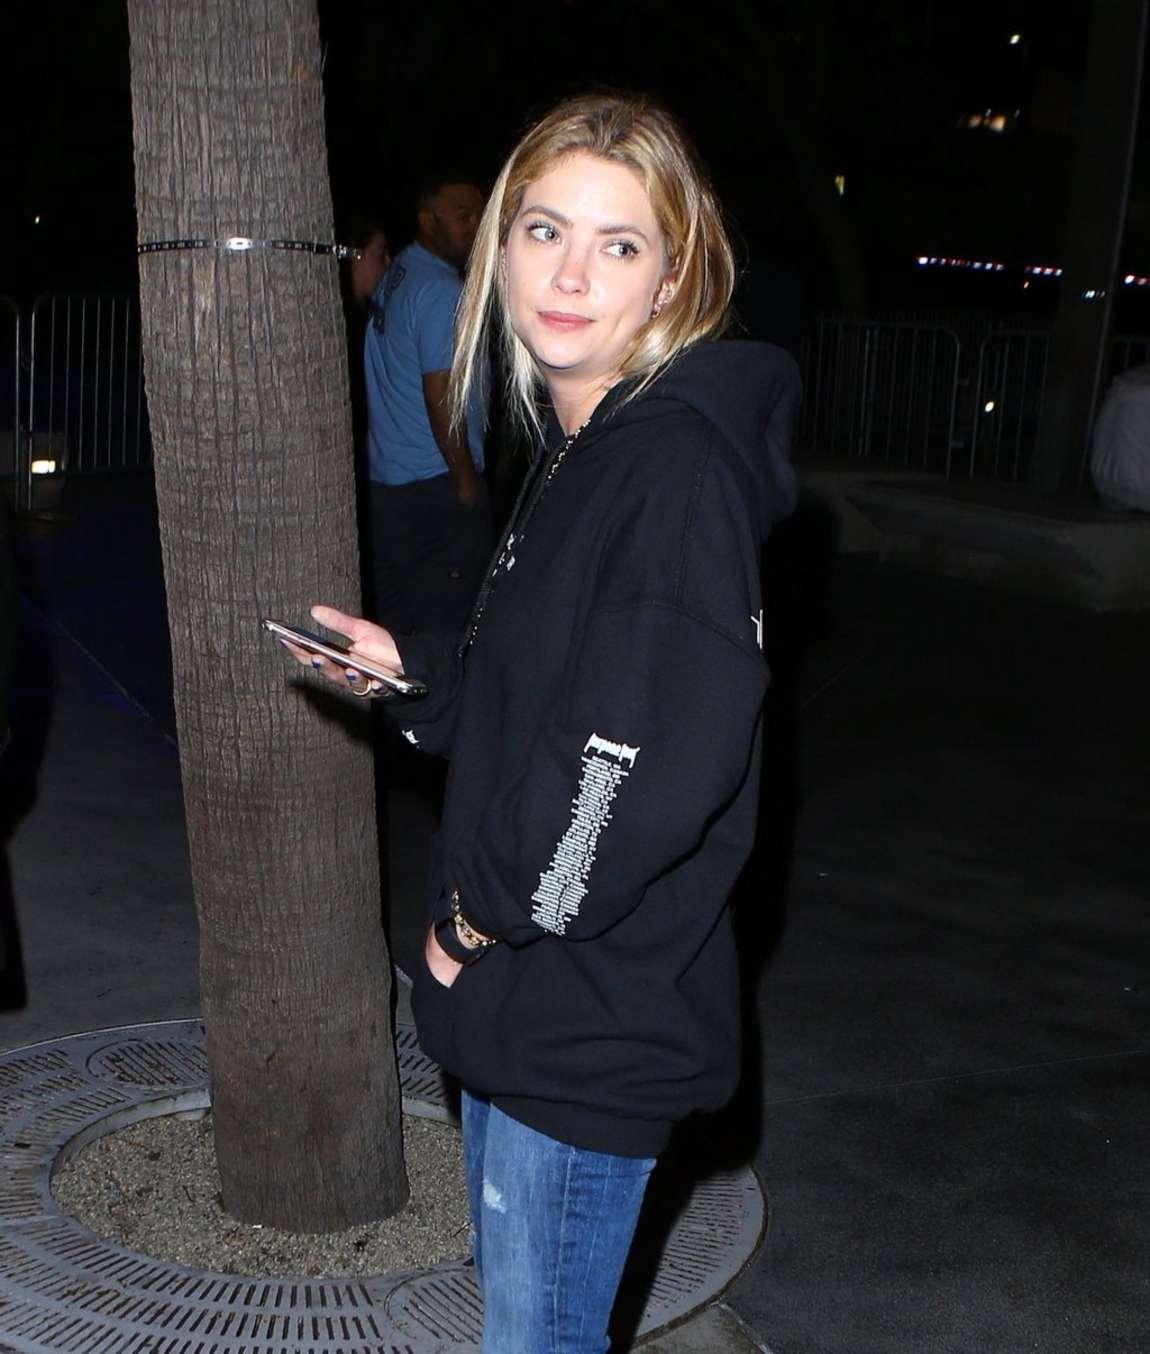 Ashley Benson - Leaving Justin Bieber Concert in Los Angeles